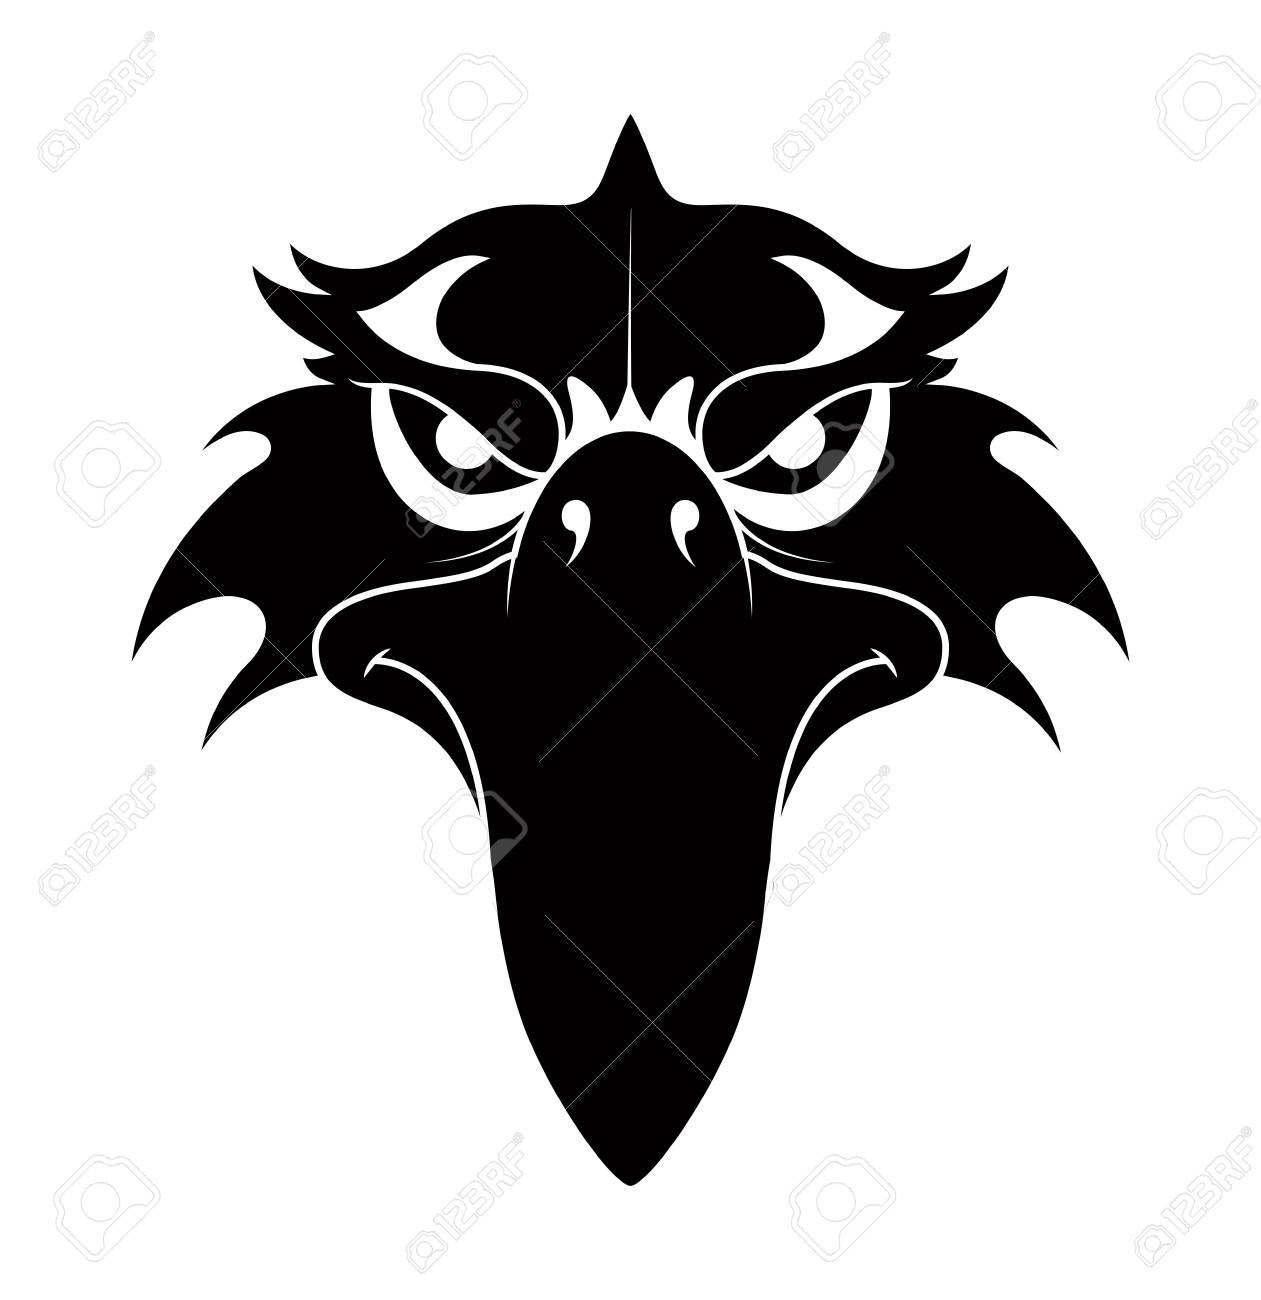 Mascot Tattoo Vector Stock Vector - 15759202